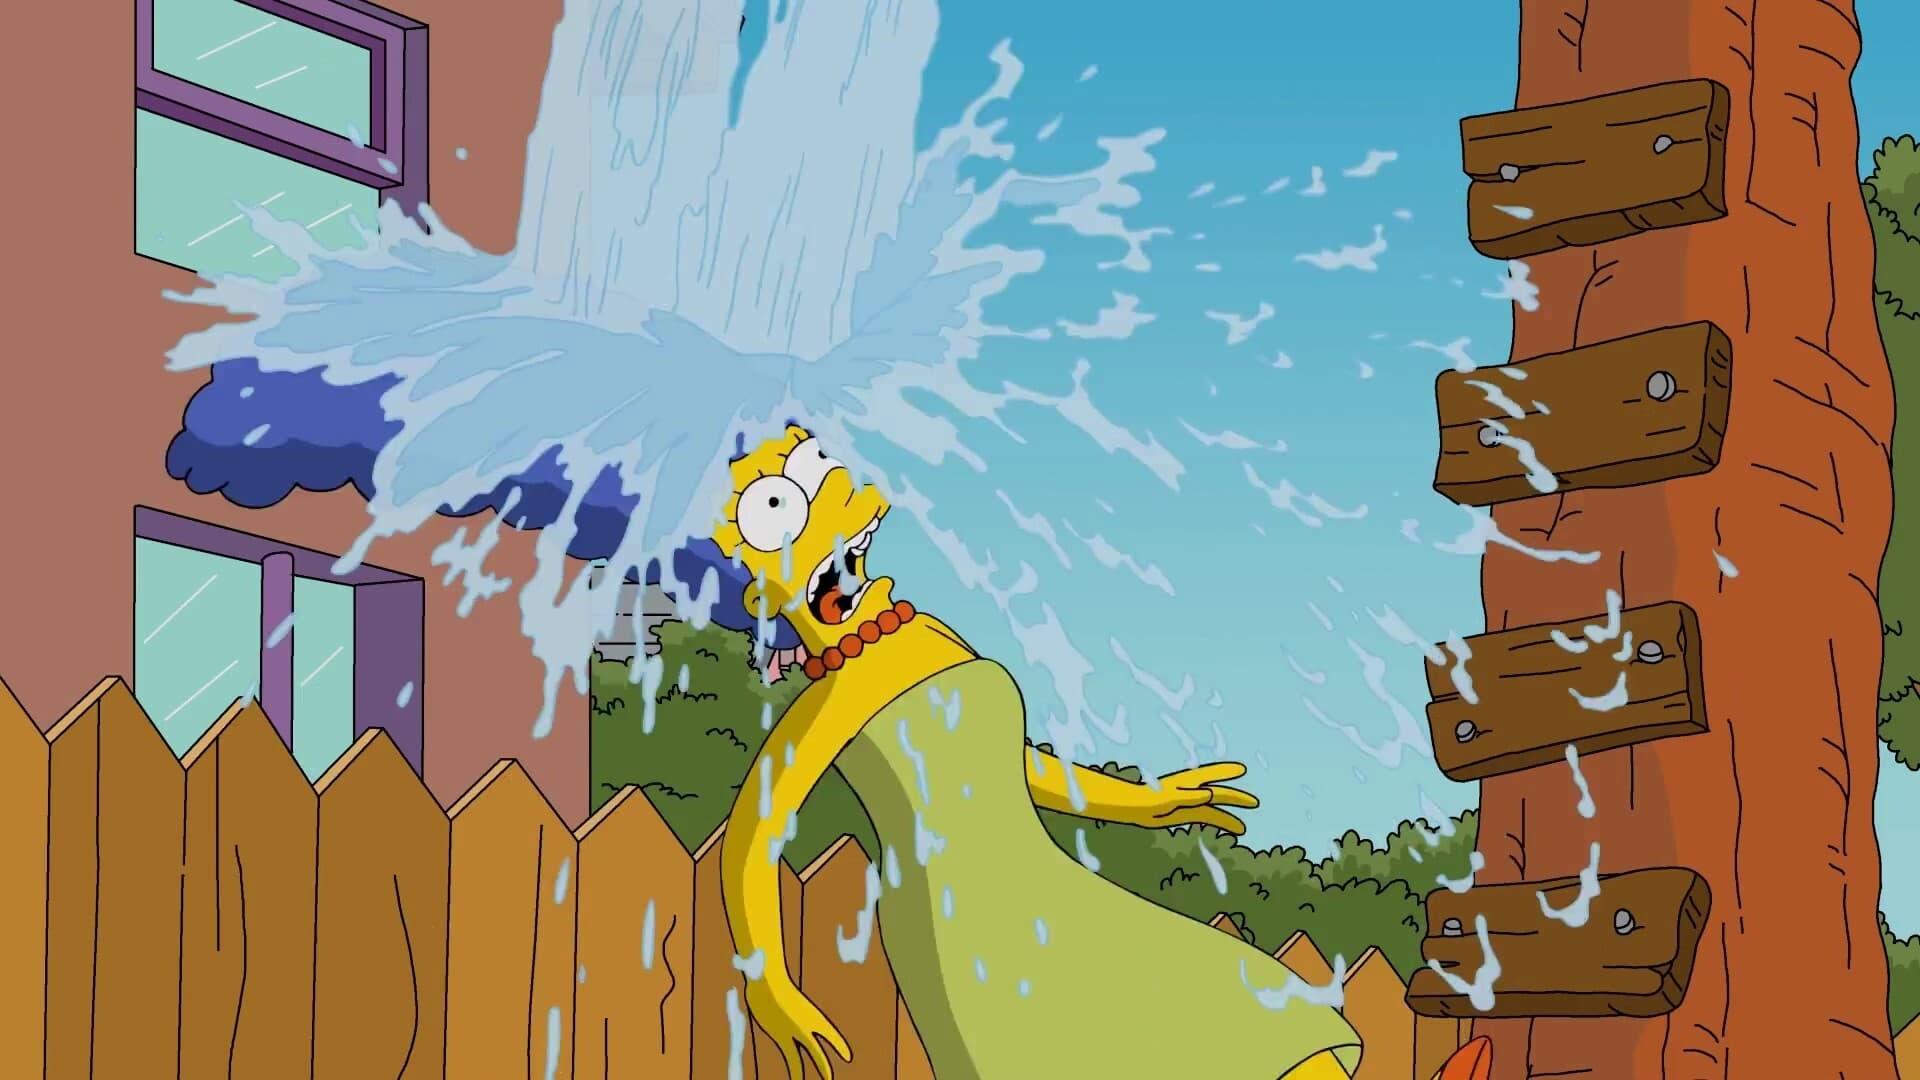 The Simpsons - Season 0 Episode 72 : Marge Simpson's ALS Ice Bucket Challenge